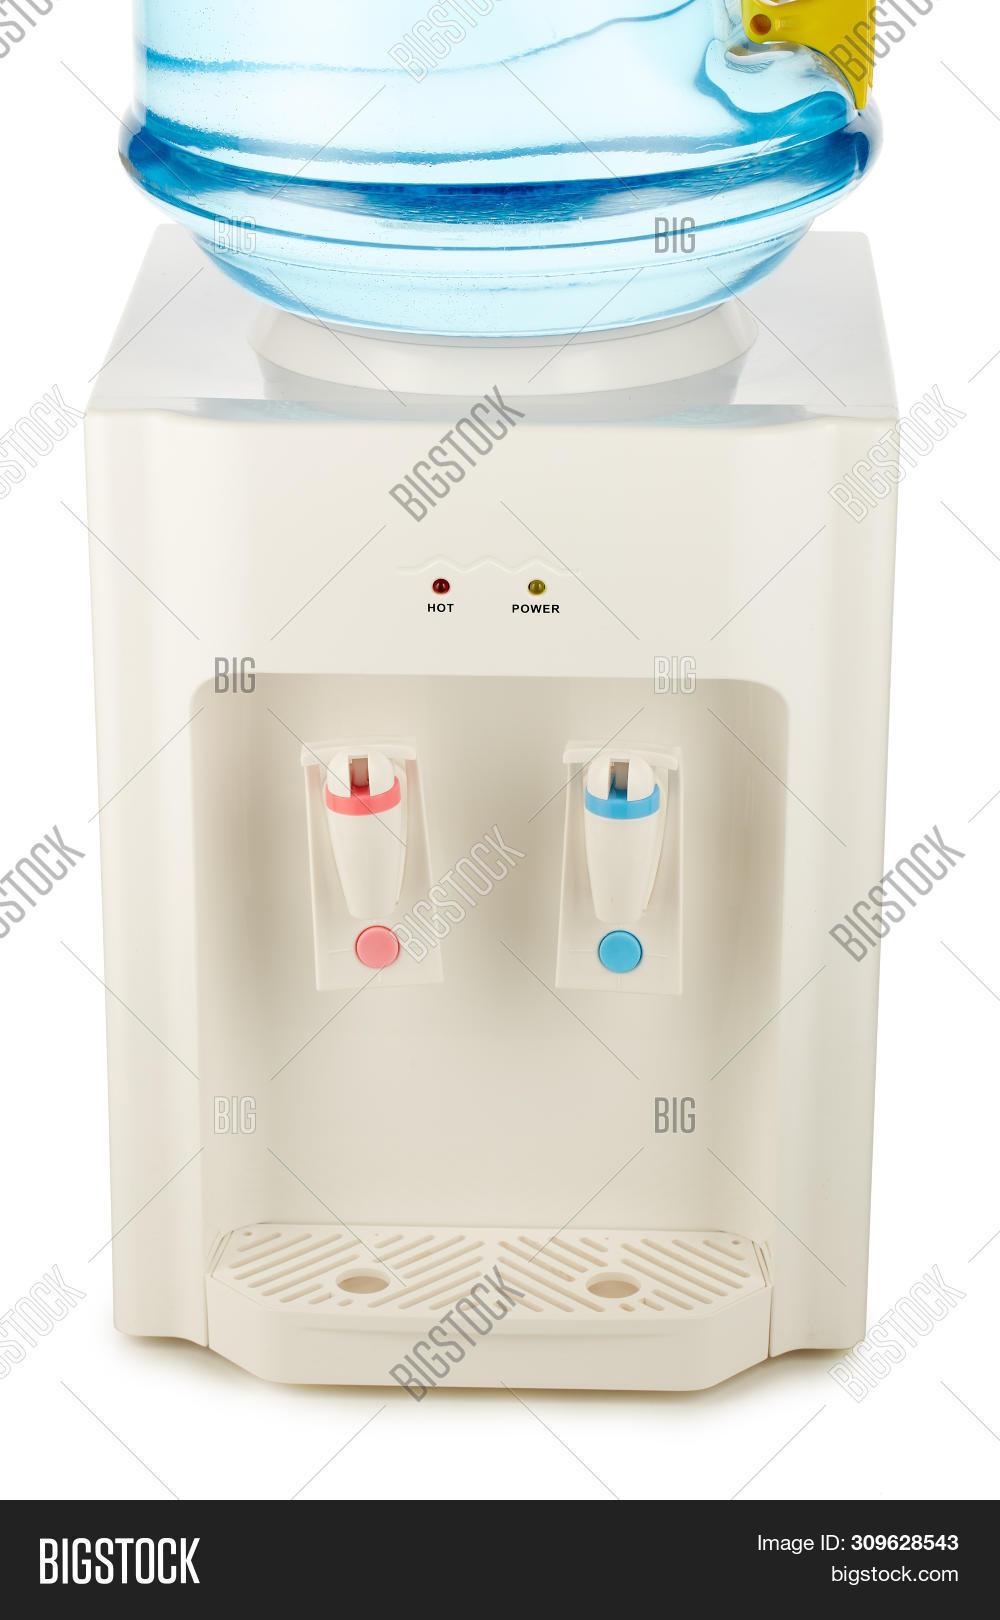 White Water Cooler Big Image Photo Free Trial Bigstock